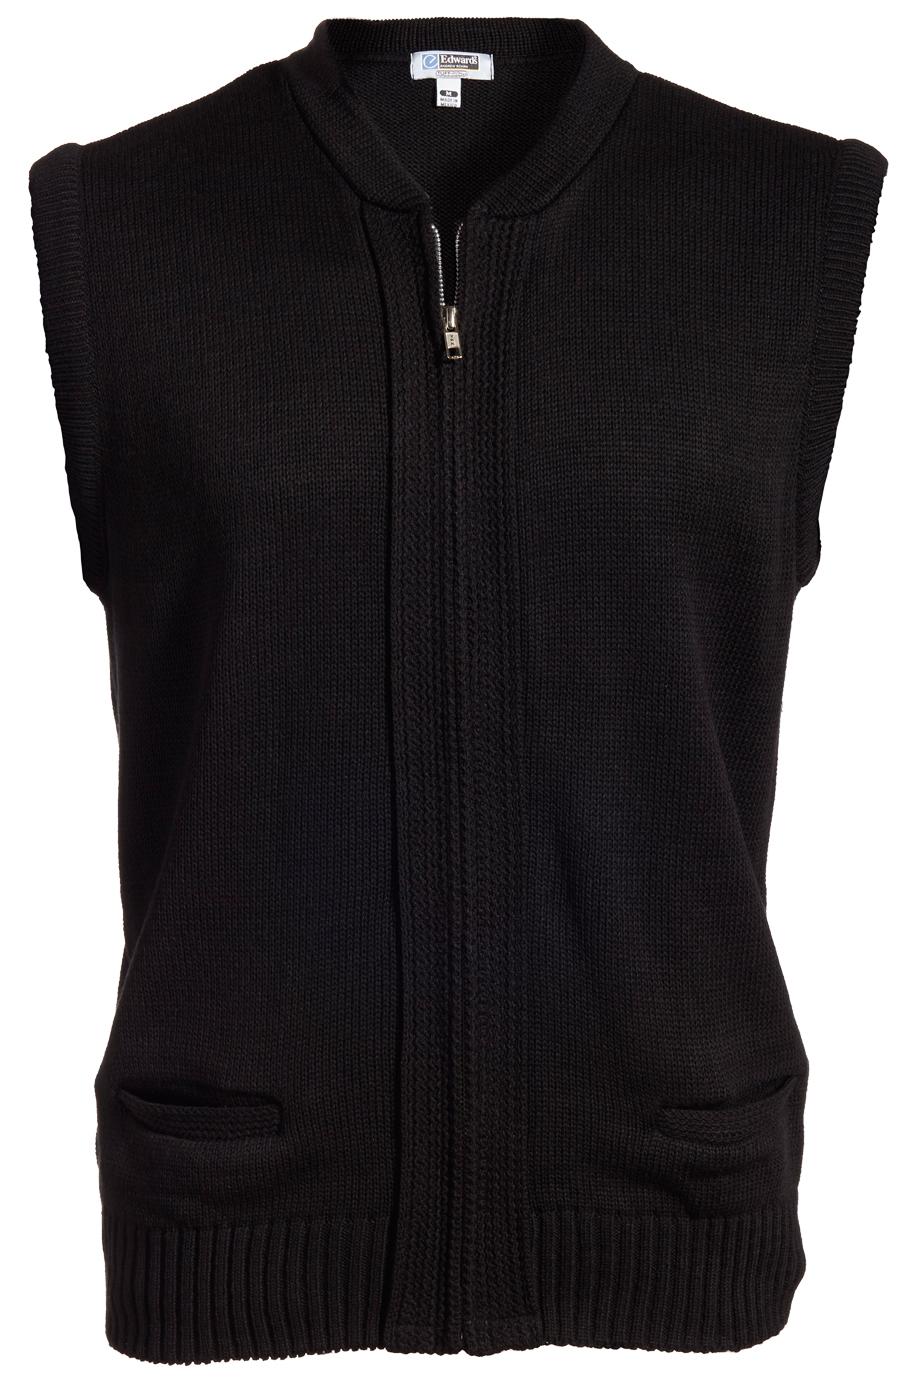 Full-Zip Heavyweight Acrylic Sweater Vest 302